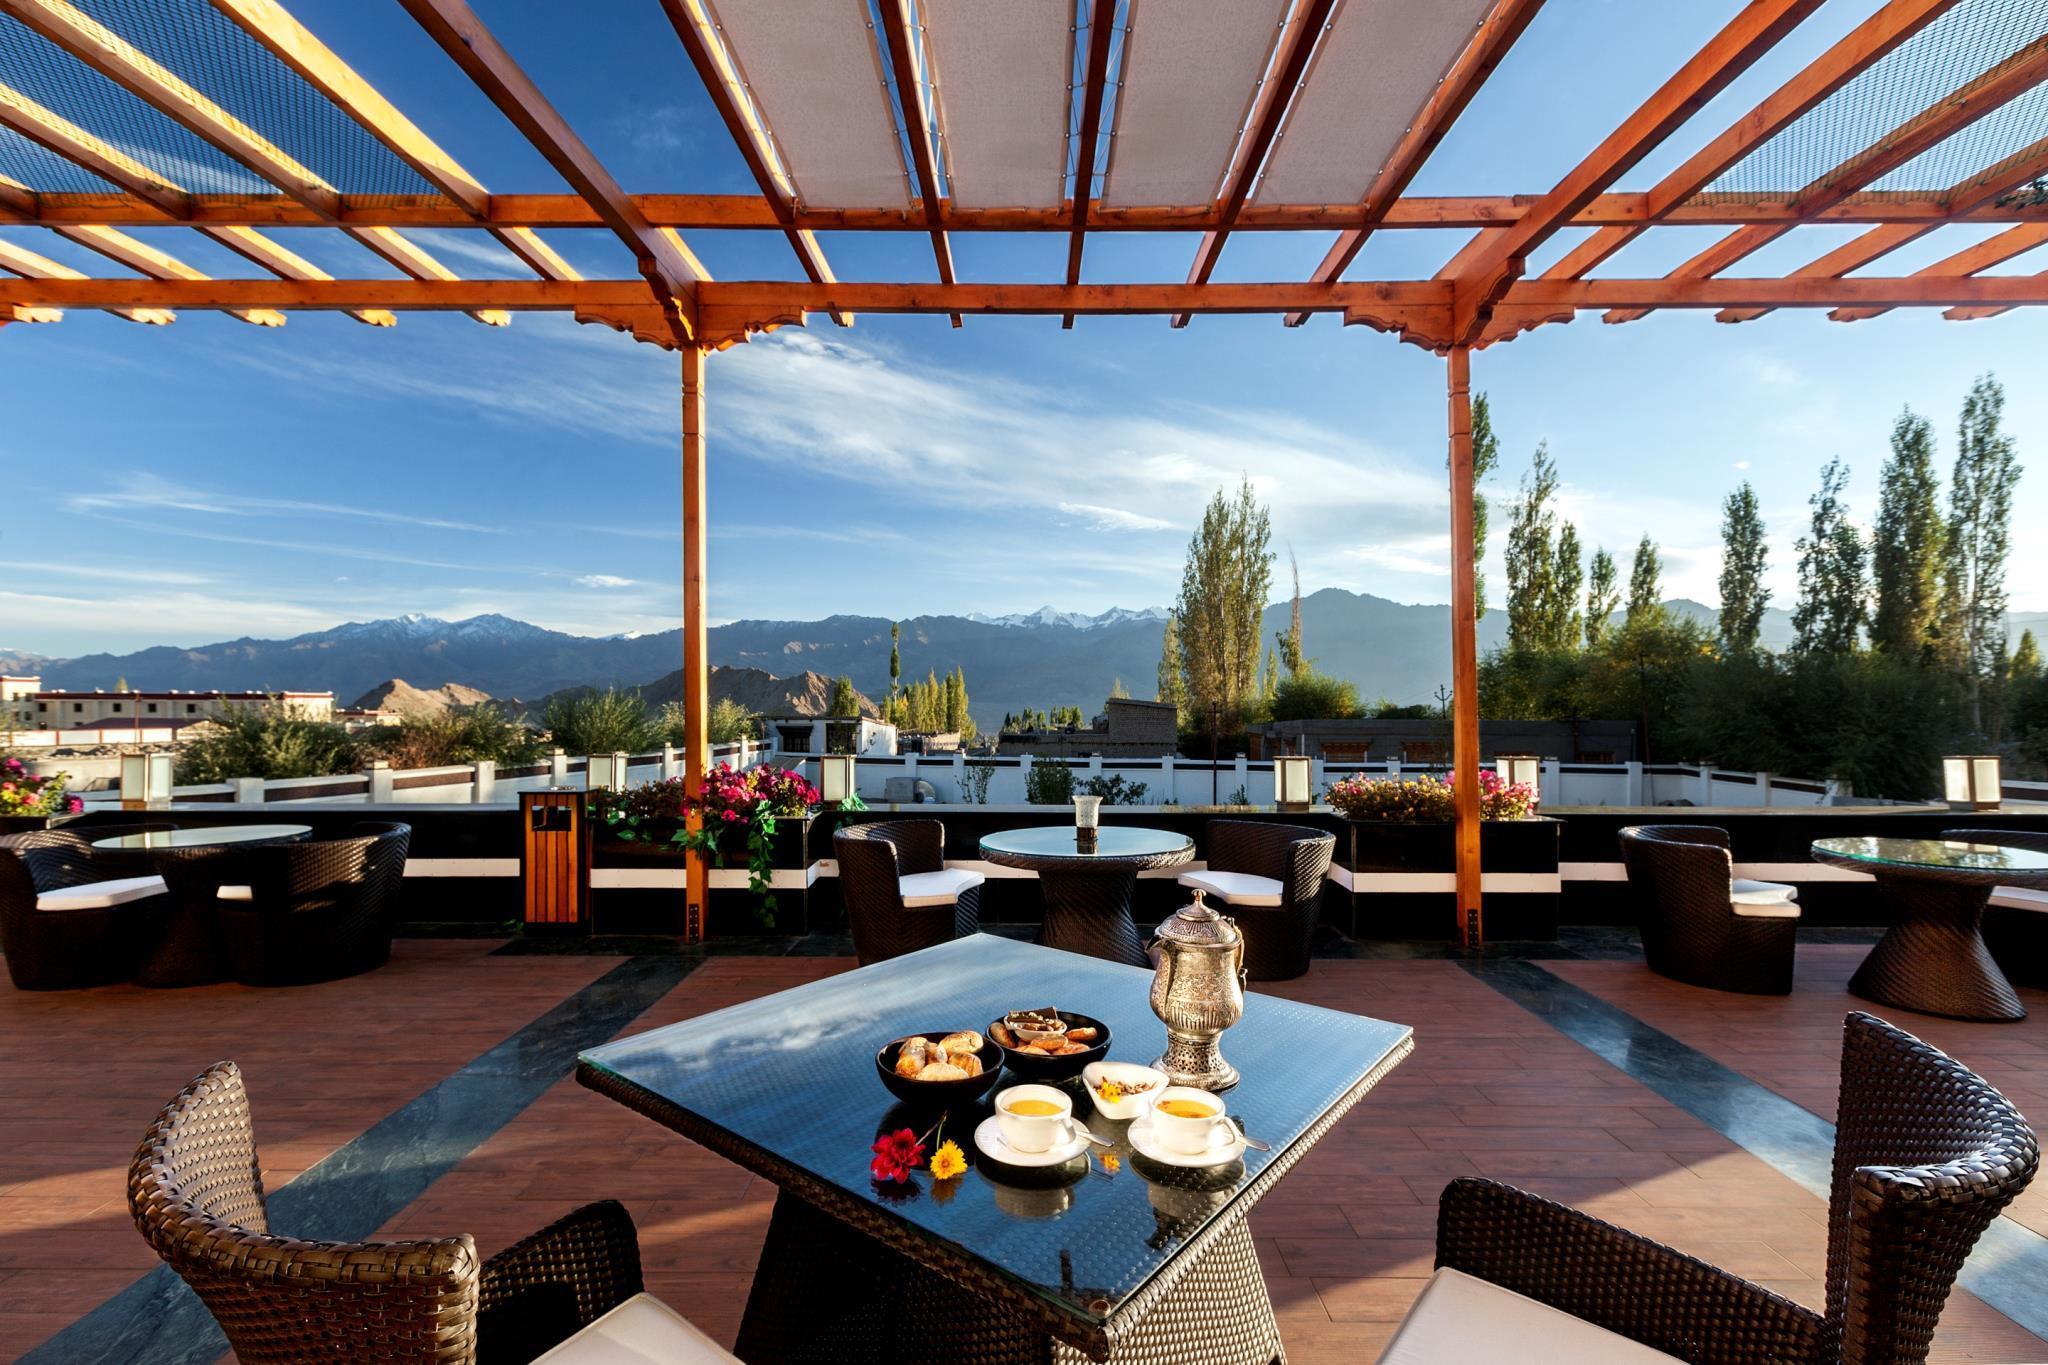 The Grand Dragon Hotel, Leh (Ladakh)